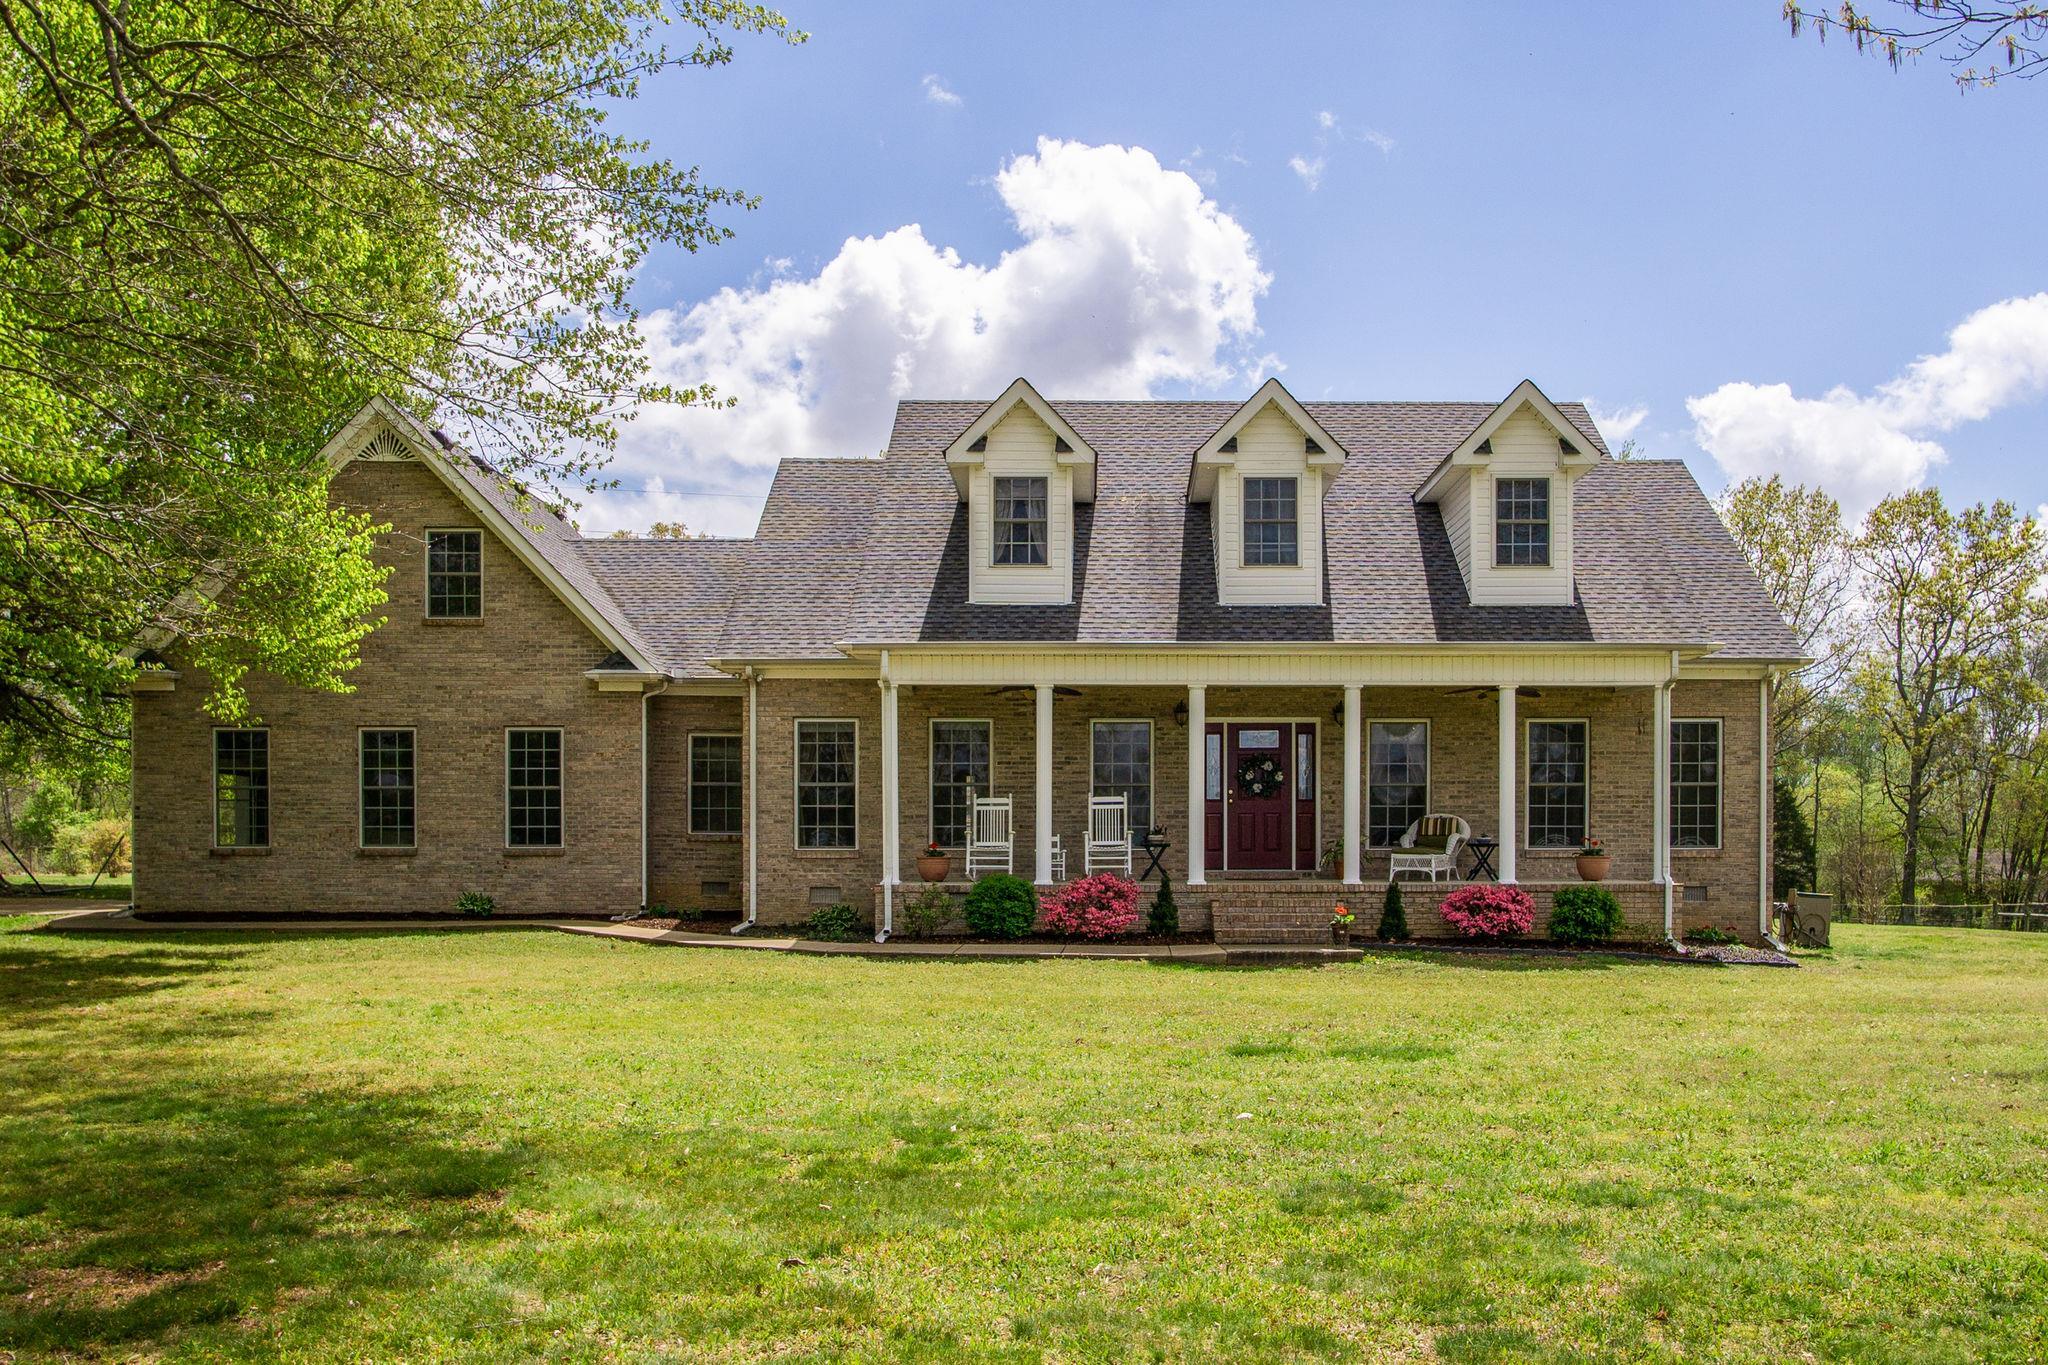 726 Ardmore Hwy, Taft, TN 38488 - Taft, TN real estate listing